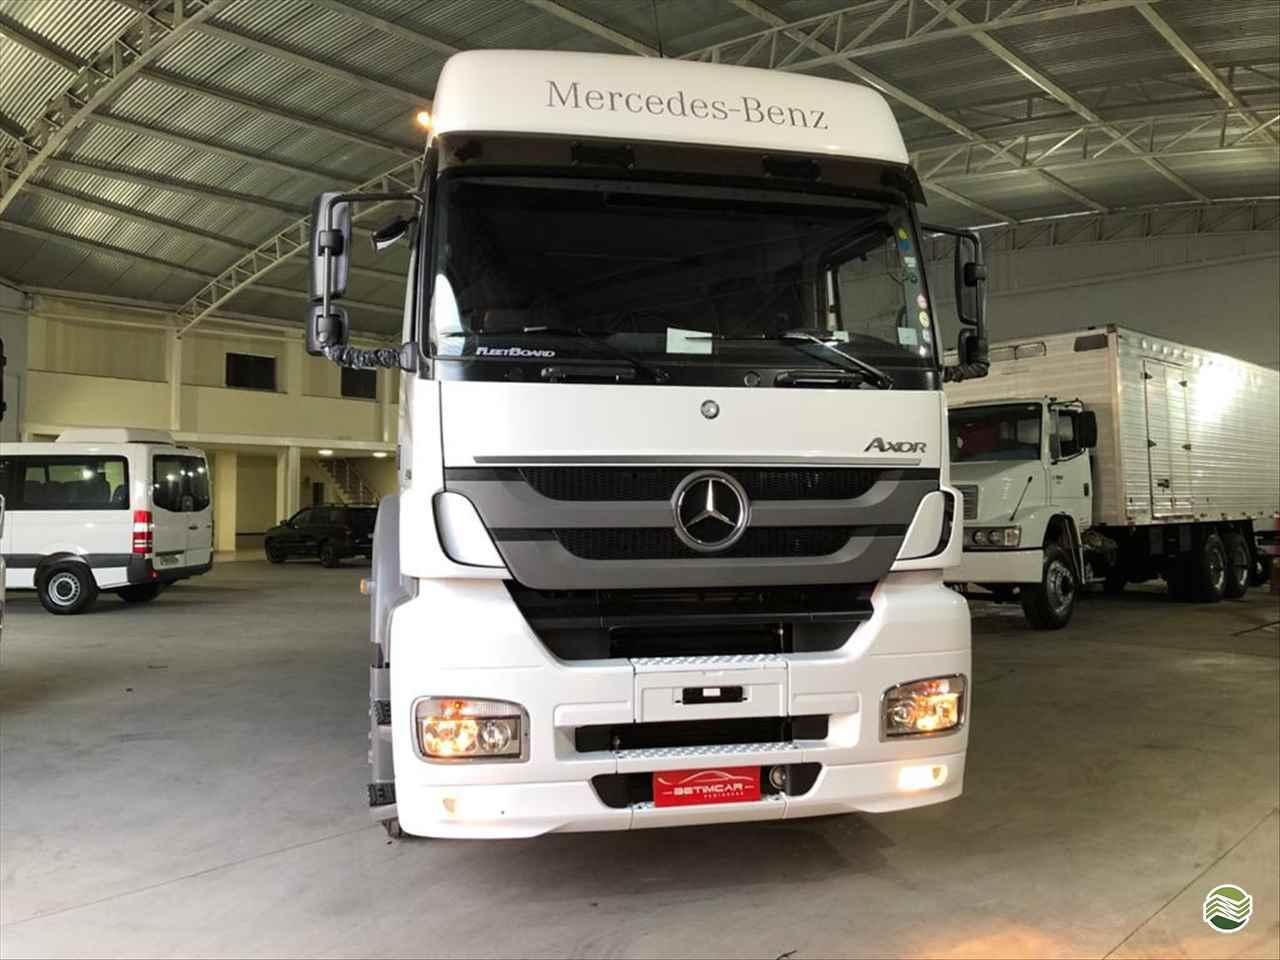 CAMINHAO MERCEDES-BENZ MB 2544 Chassis Truck 6x2 Abilio Miranda DIVINOPOLIS MINAS GERAIS MG